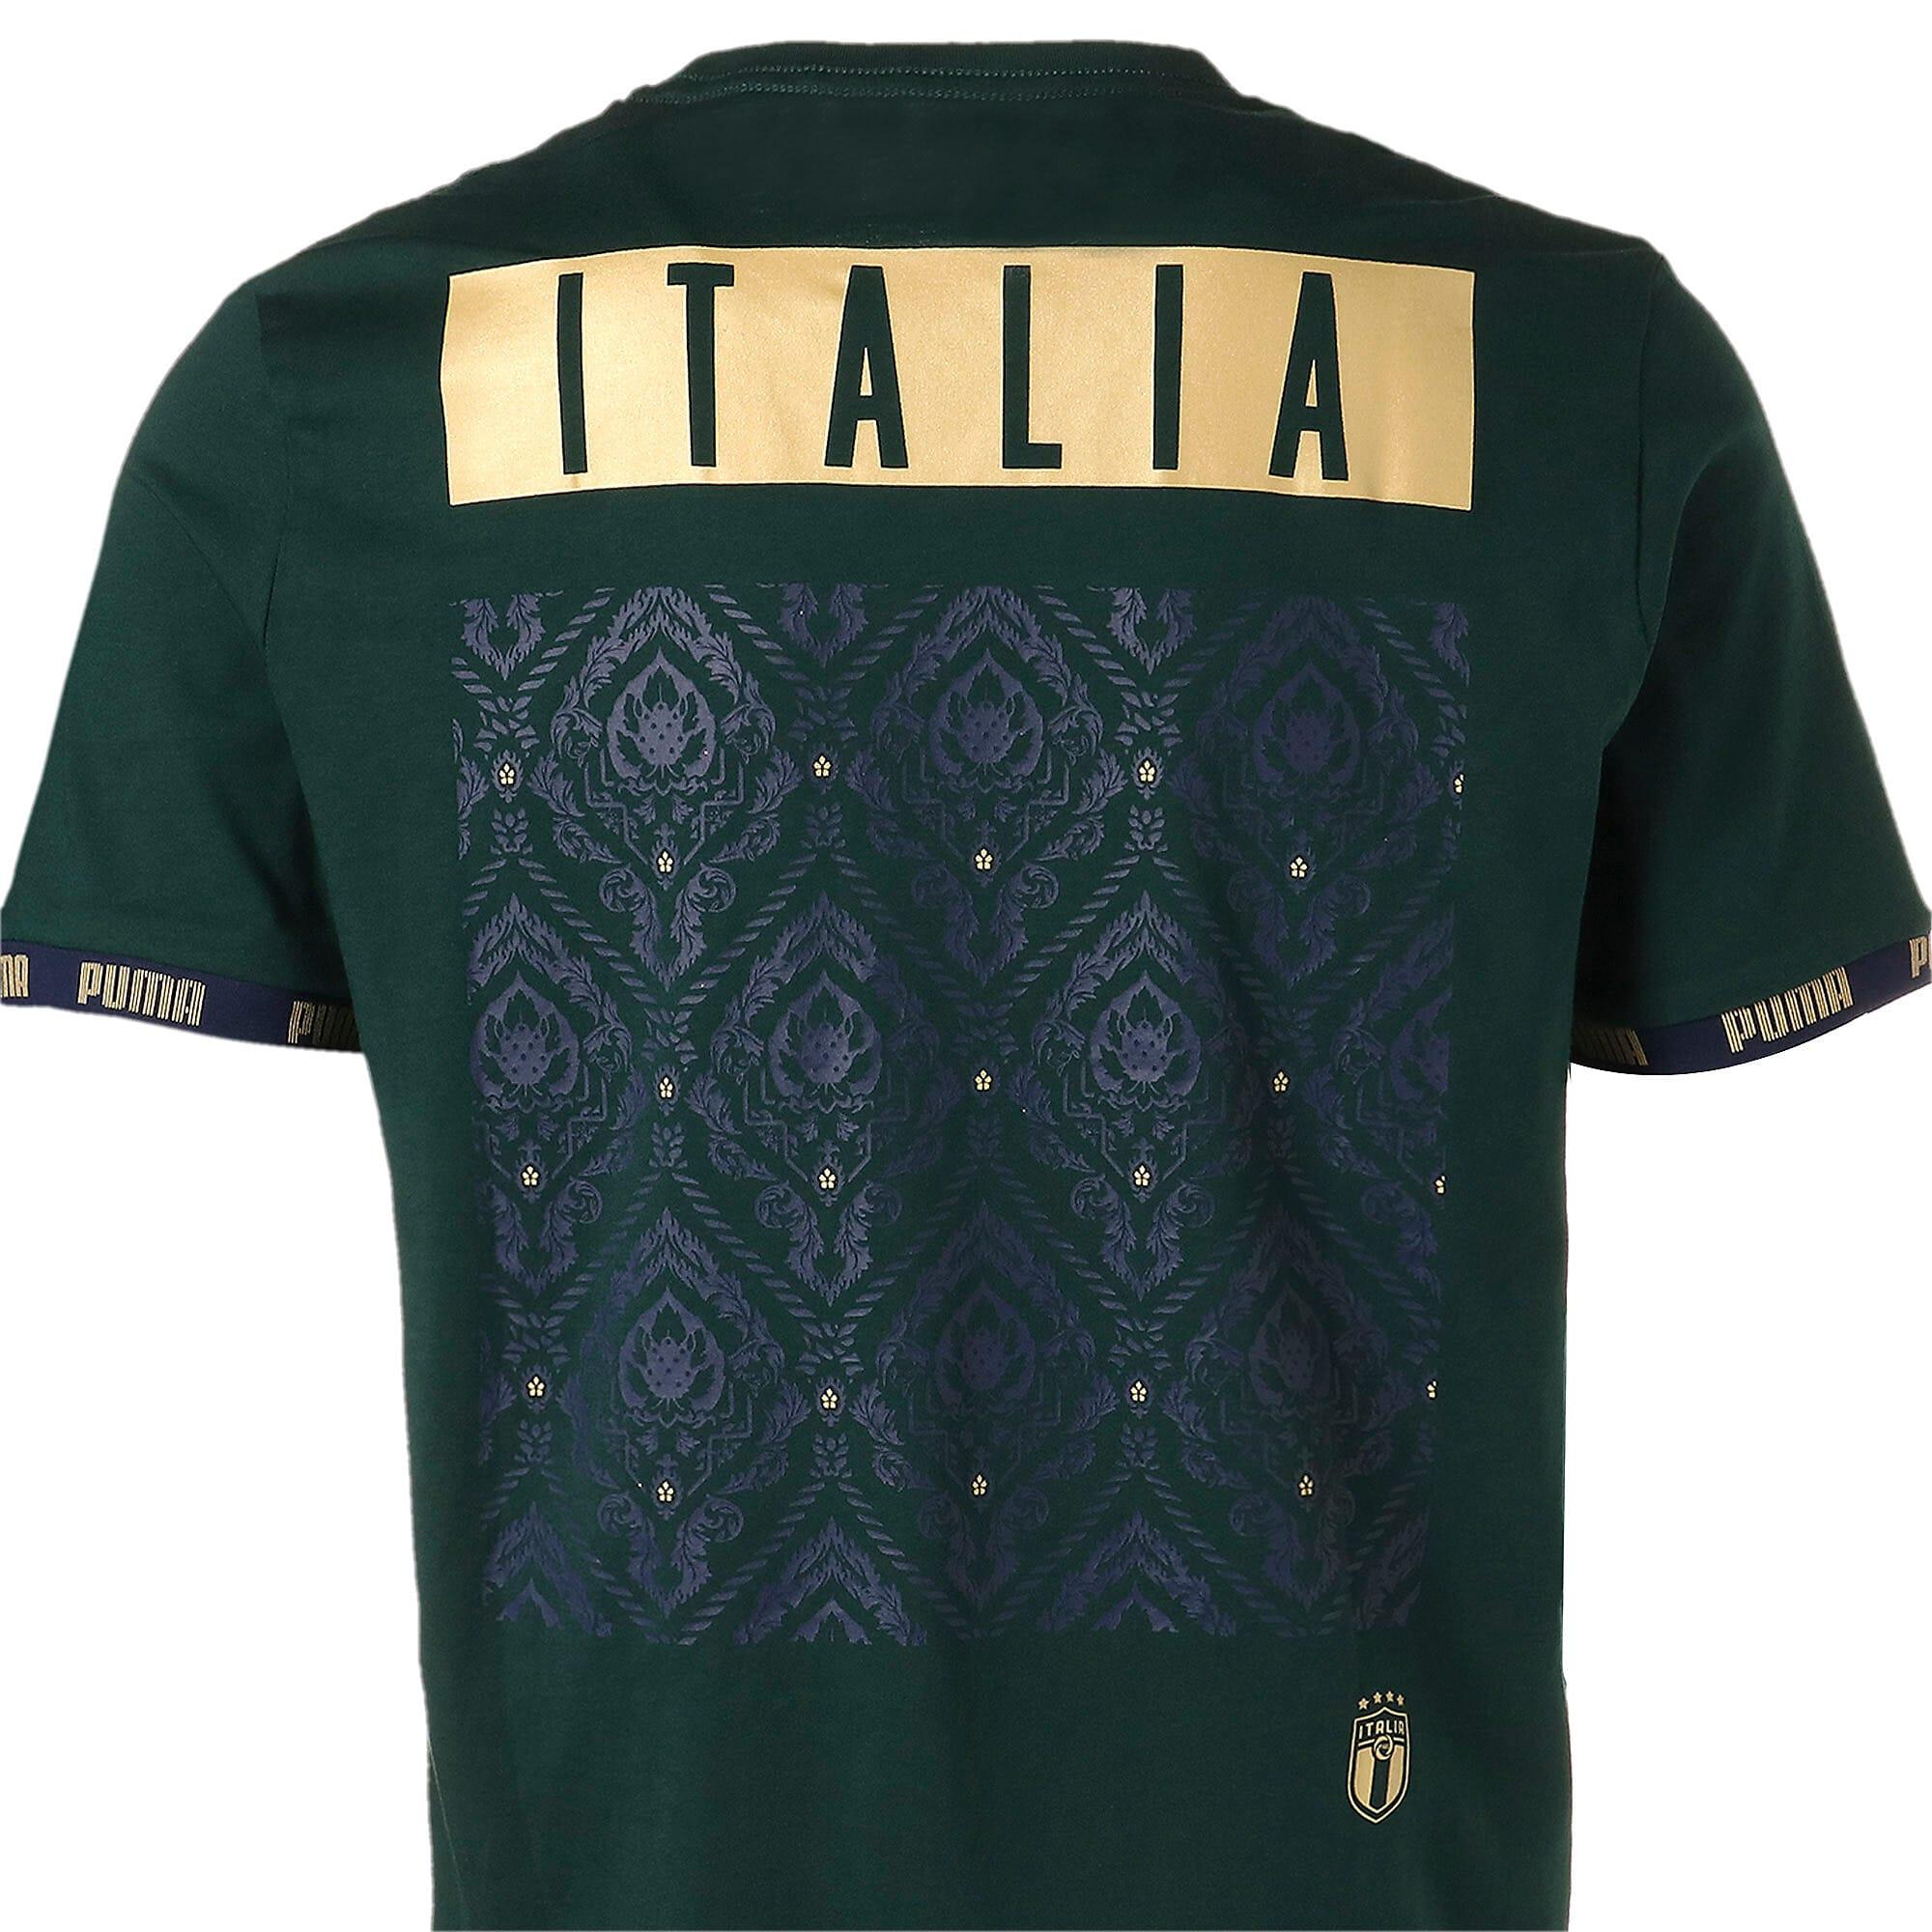 Thumbnail 8 of FIGC イタリア FTBL CULTURE Tシャツ 半袖, Ponderosa Pine, medium-JPN